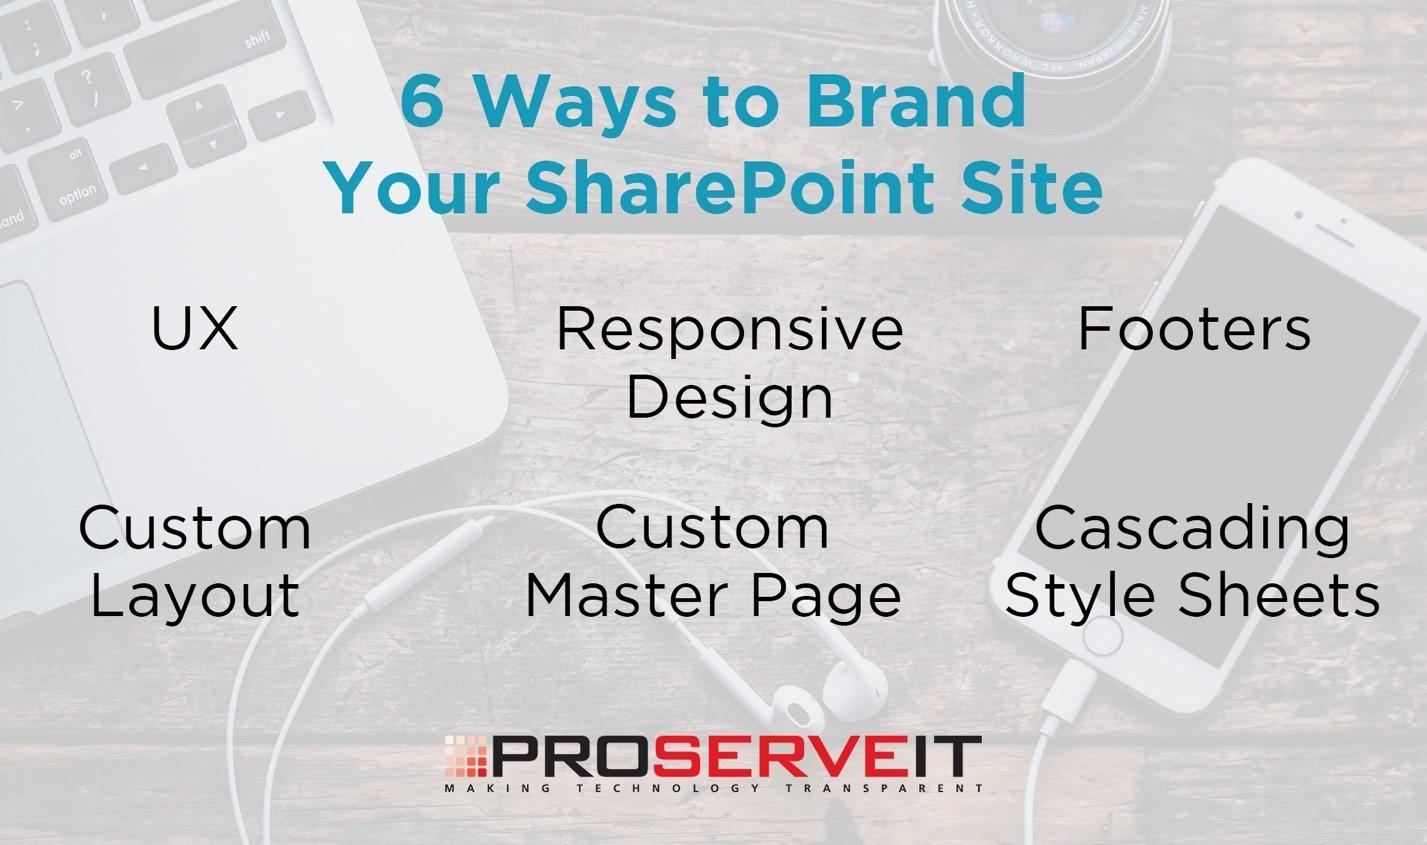 Branding SharePoint